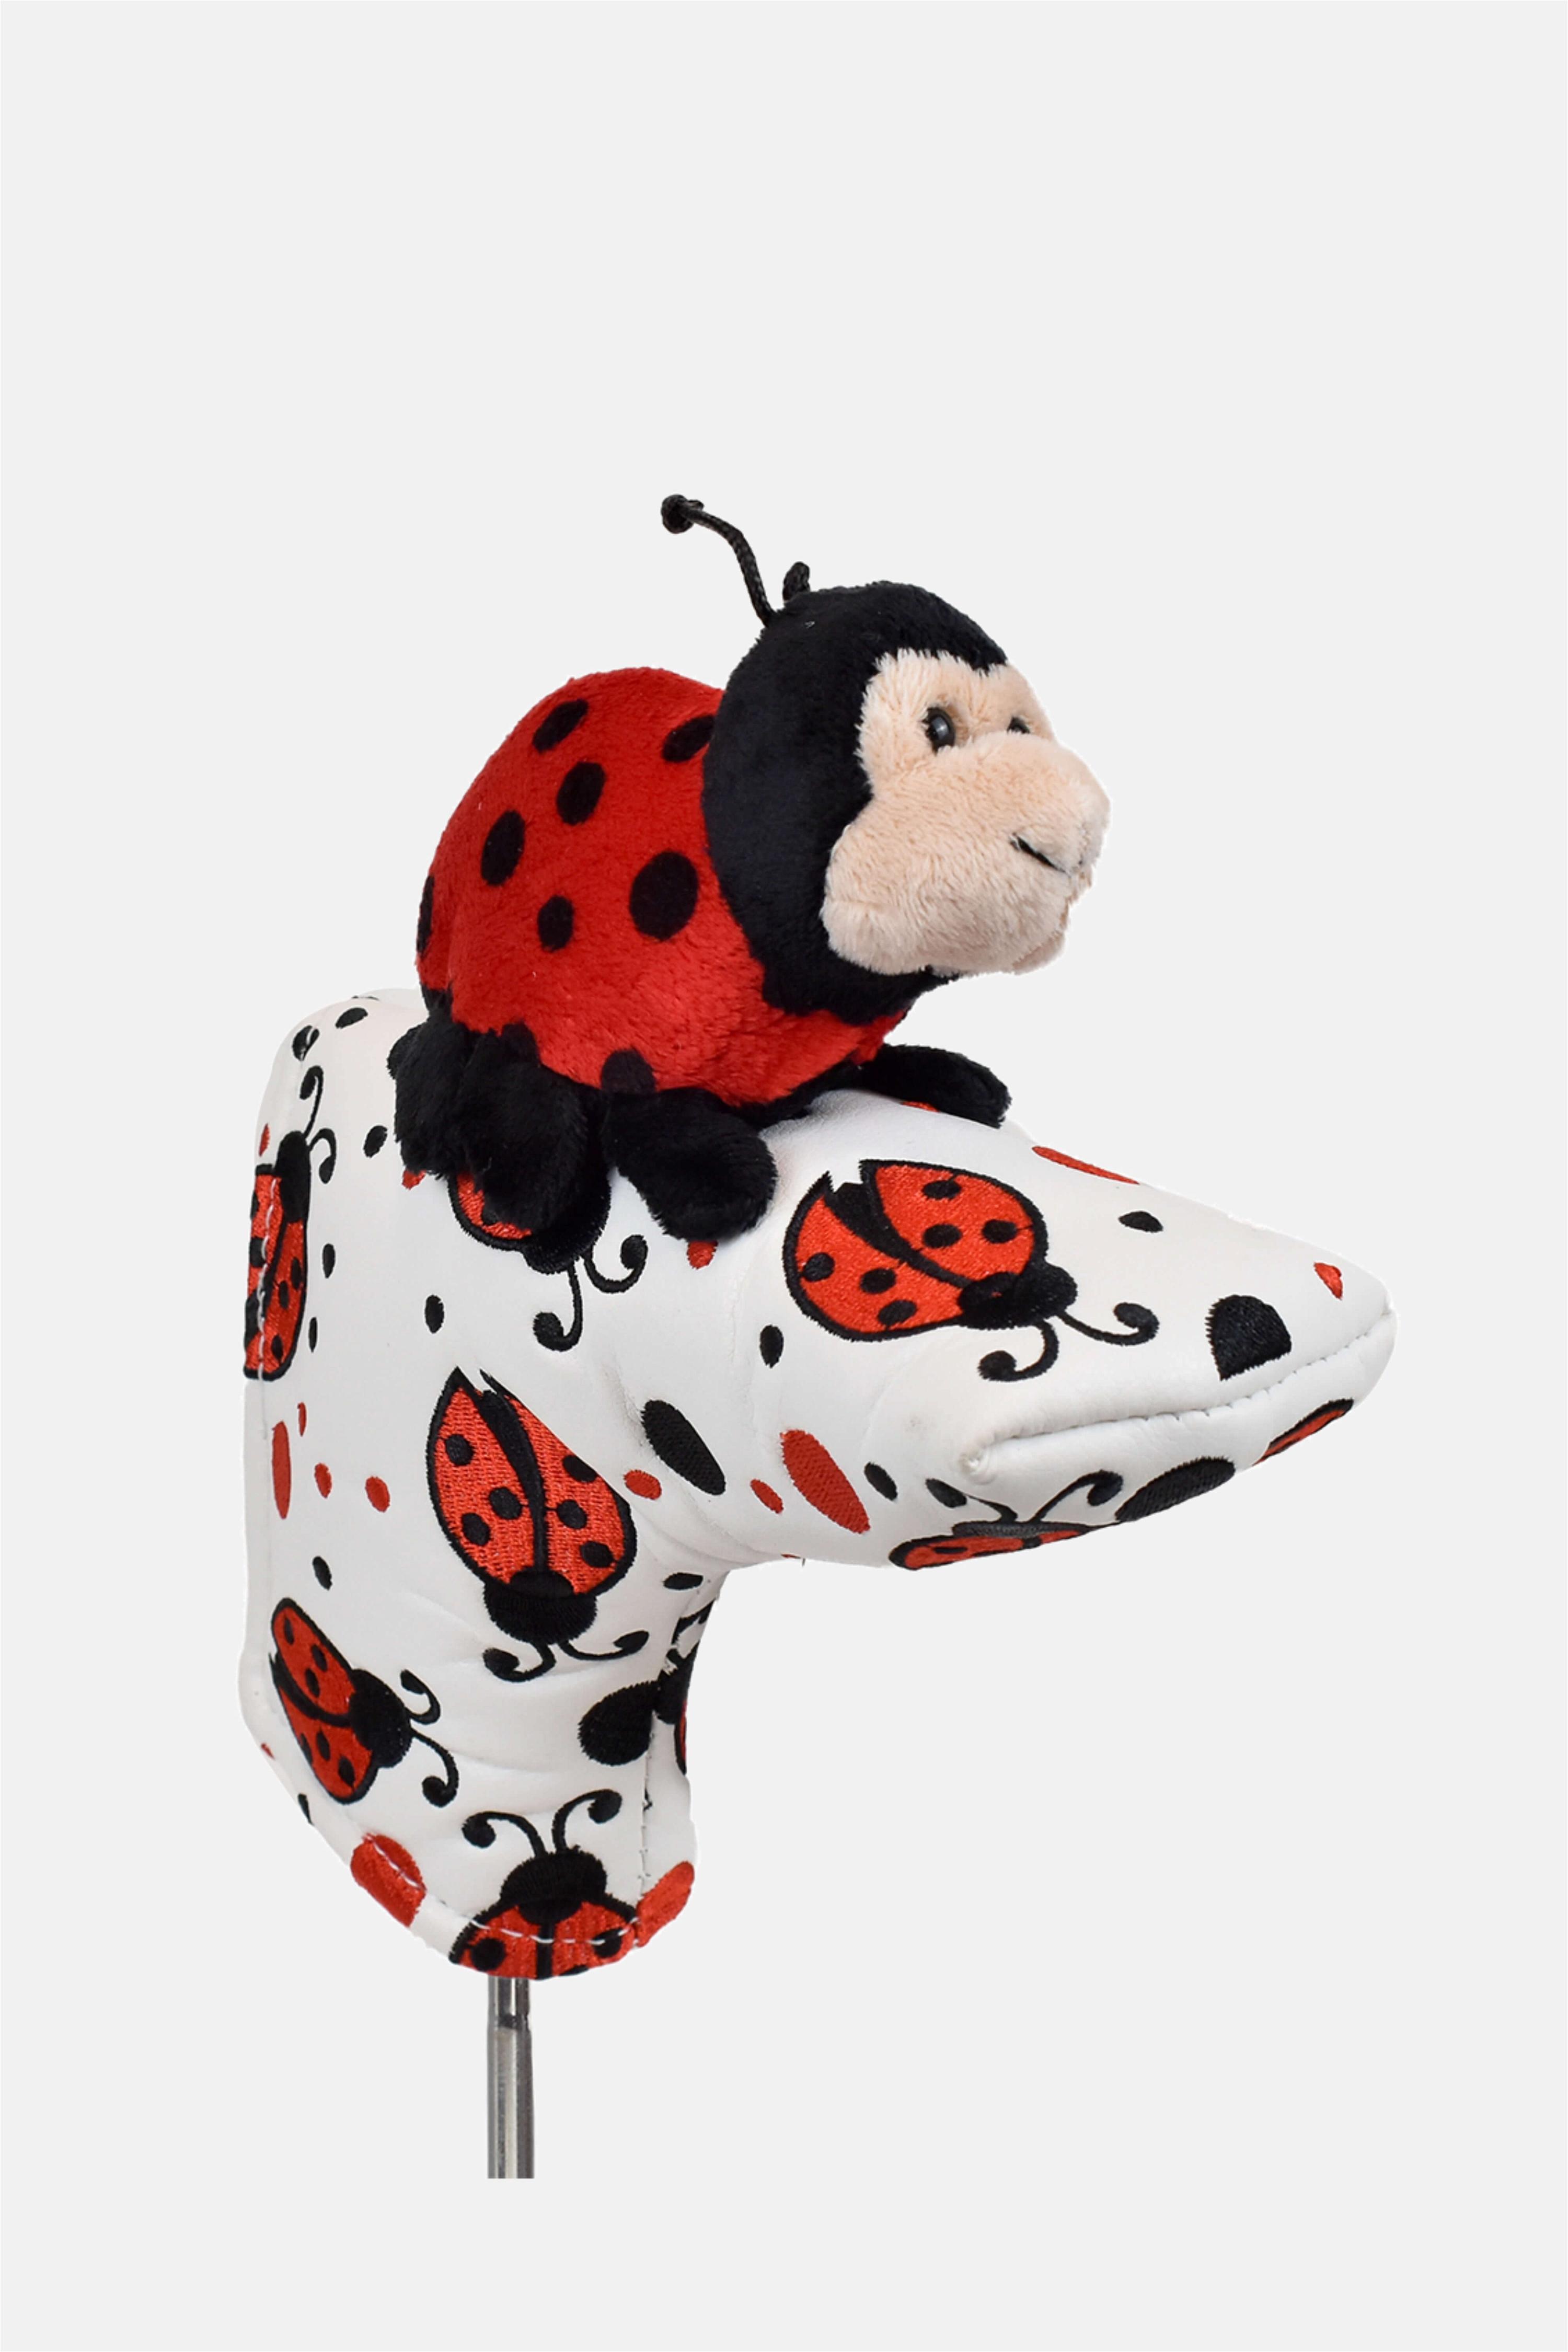 Puttercover Ladybug